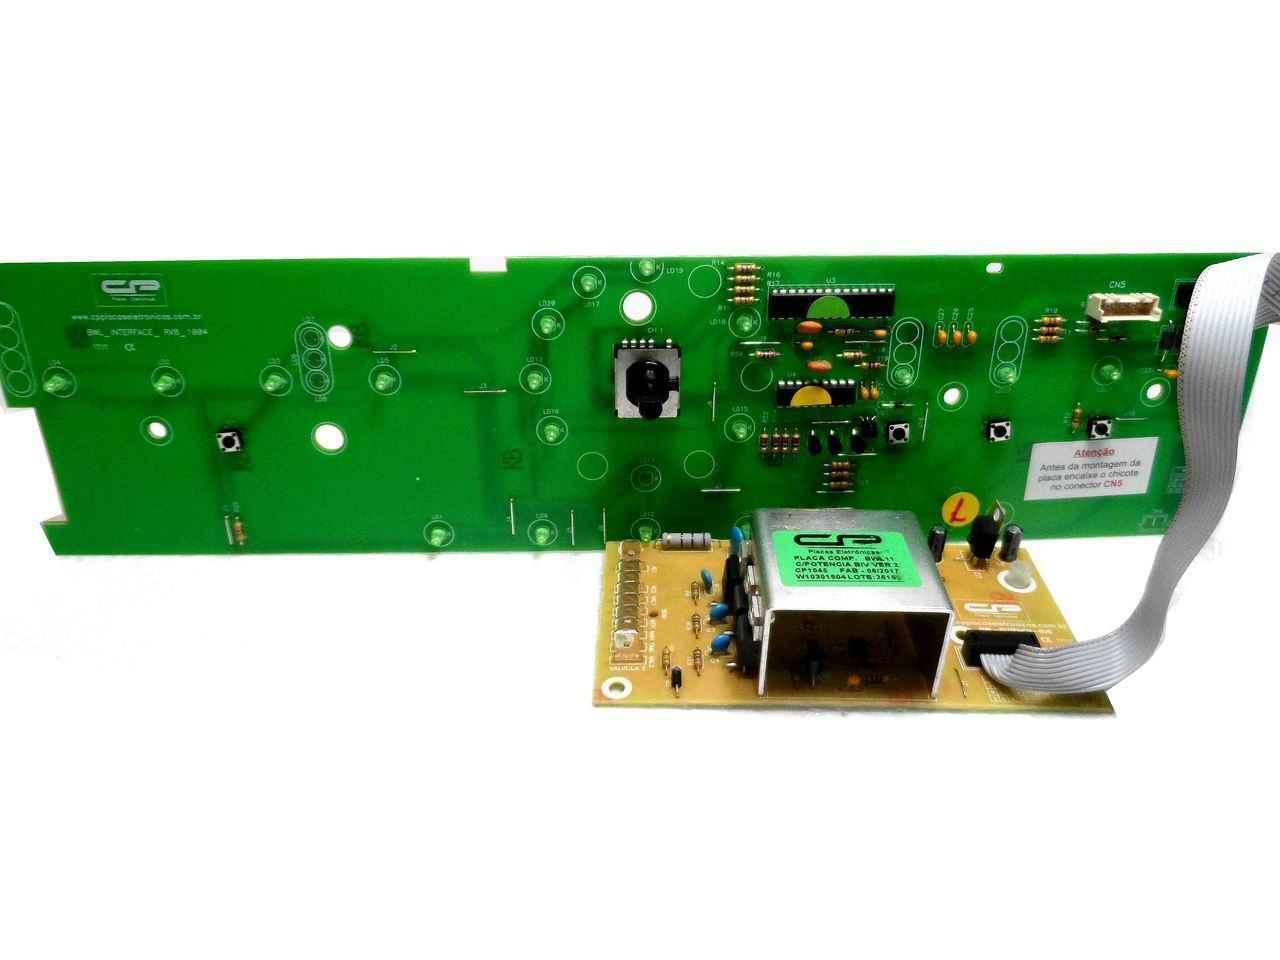 Placa eletrônica Potência e Interface Lavadora Brastemp Bwl11 Versão 2 - CP1045